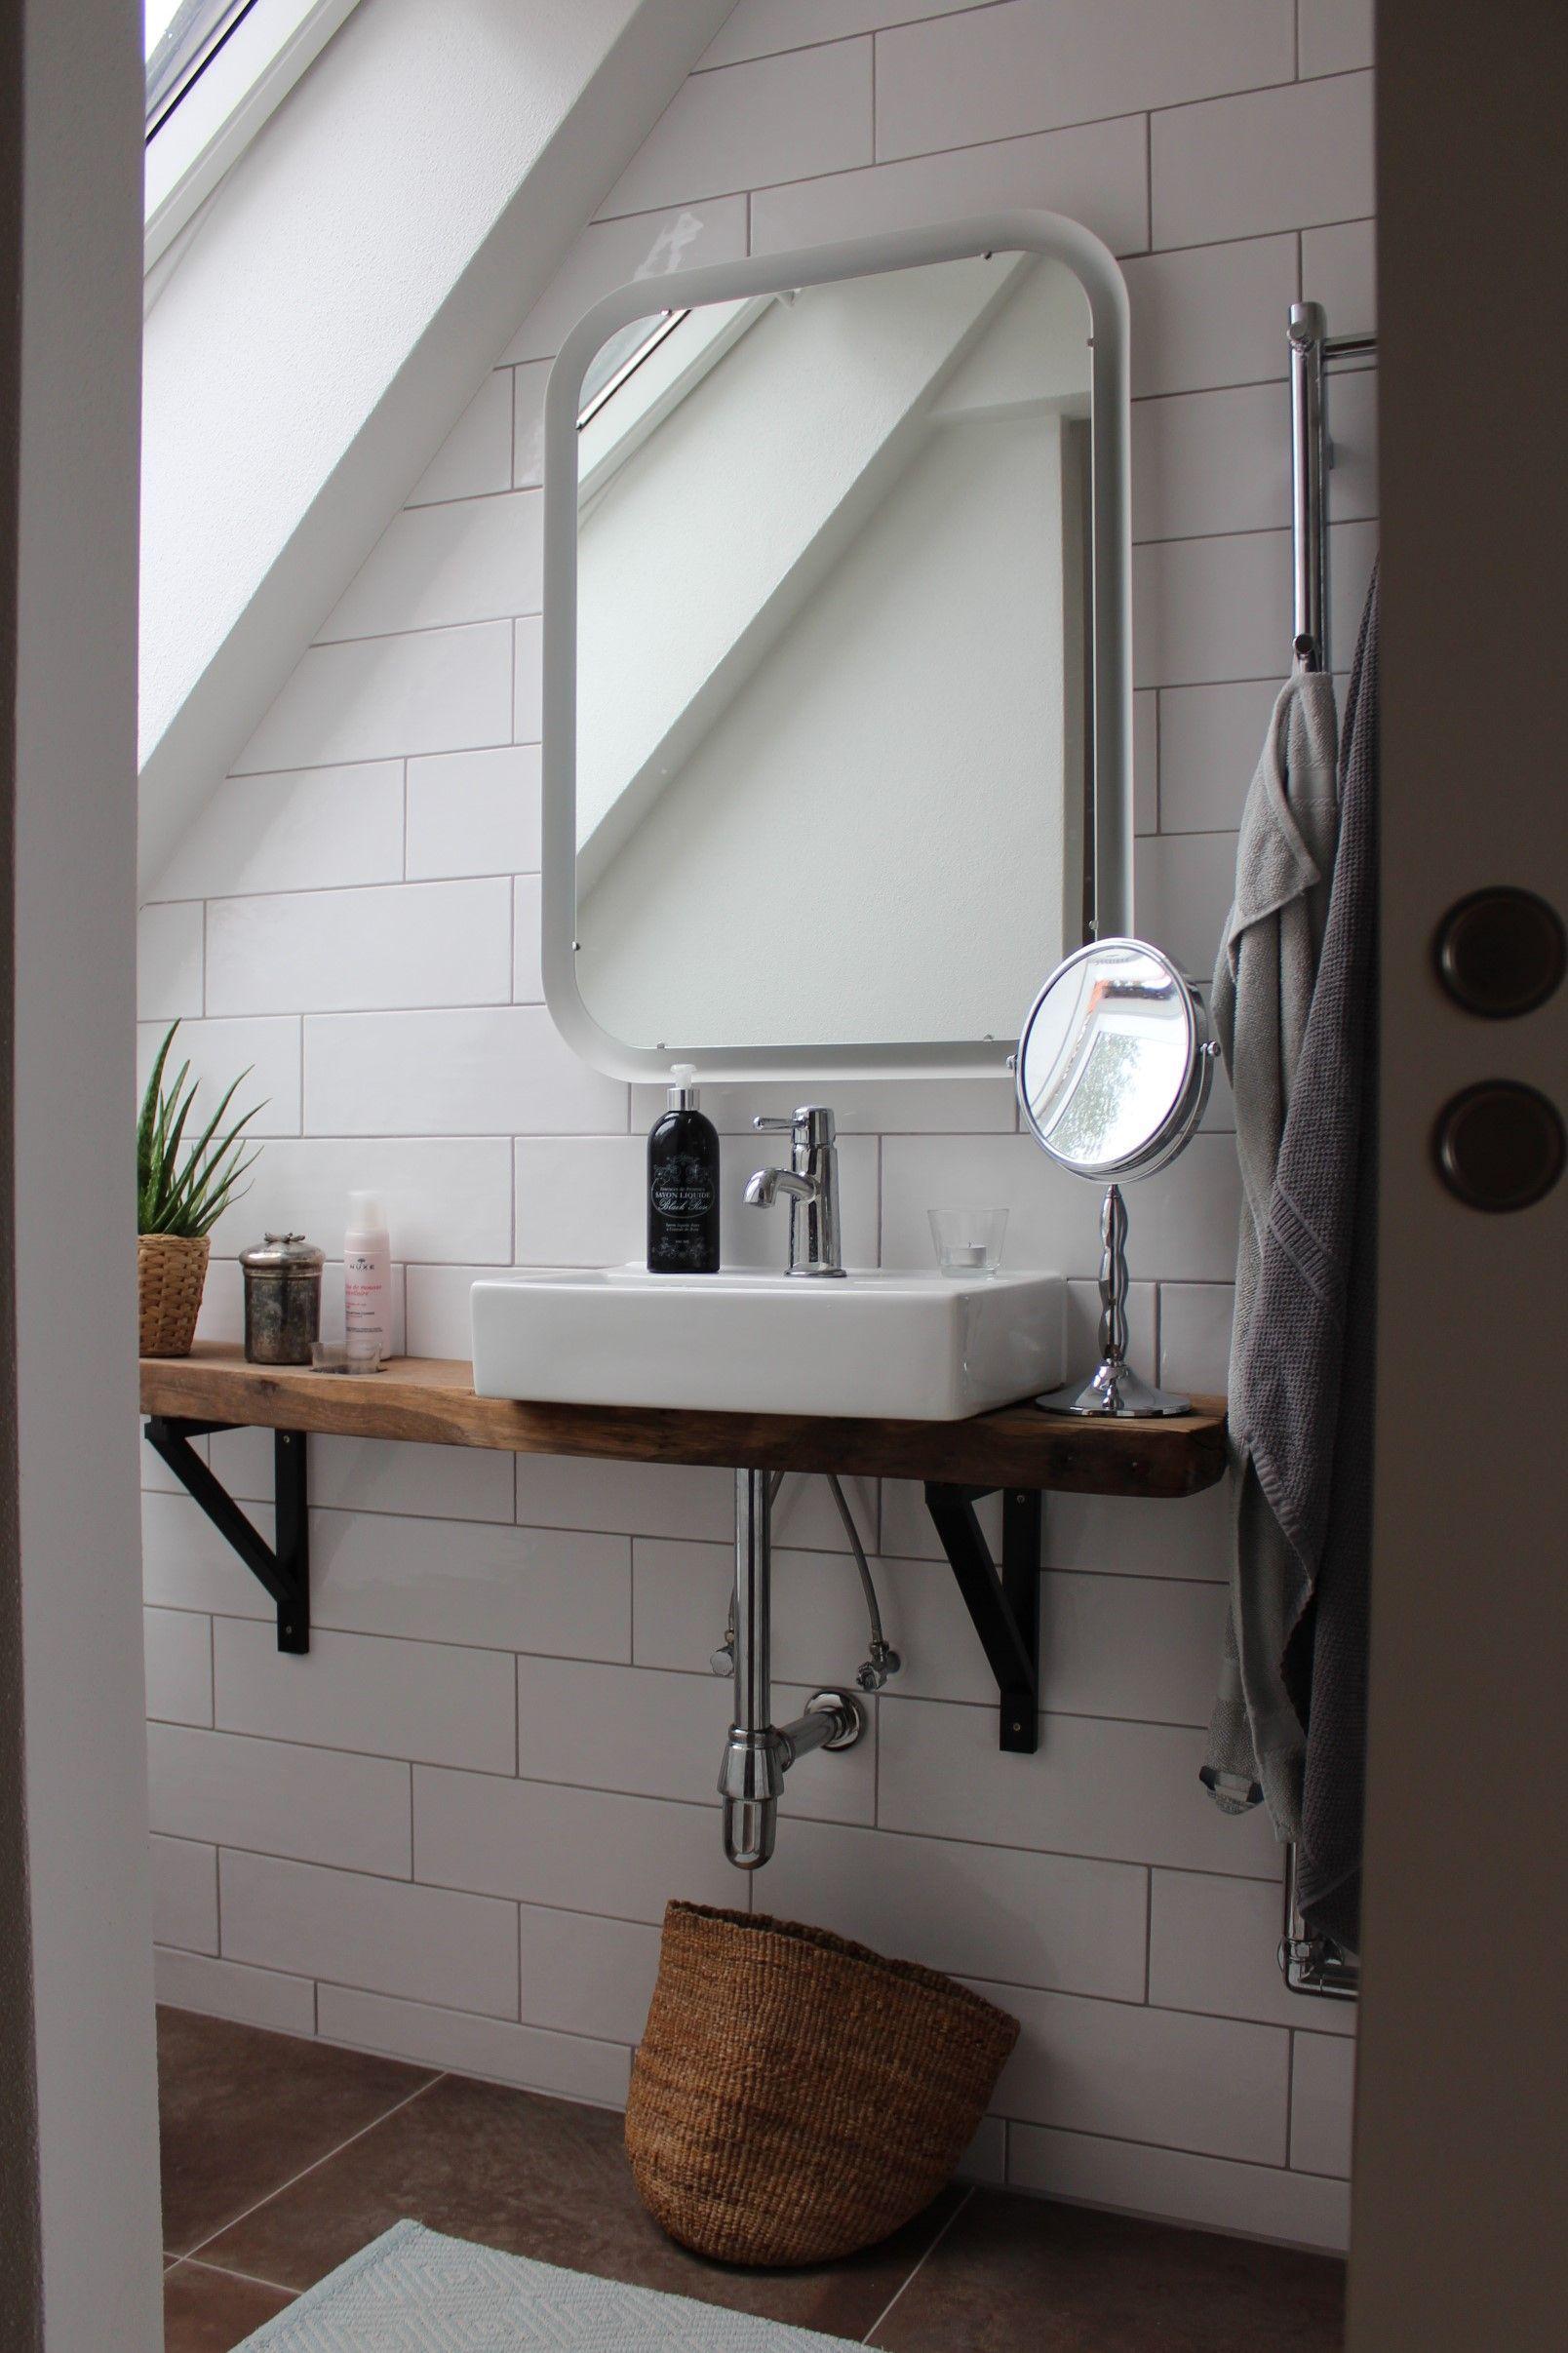 39 Scandinavian Bathroom Ideas For Your Home Scandinavian Bathroom Scandinavian Showers Trendy Bathroom